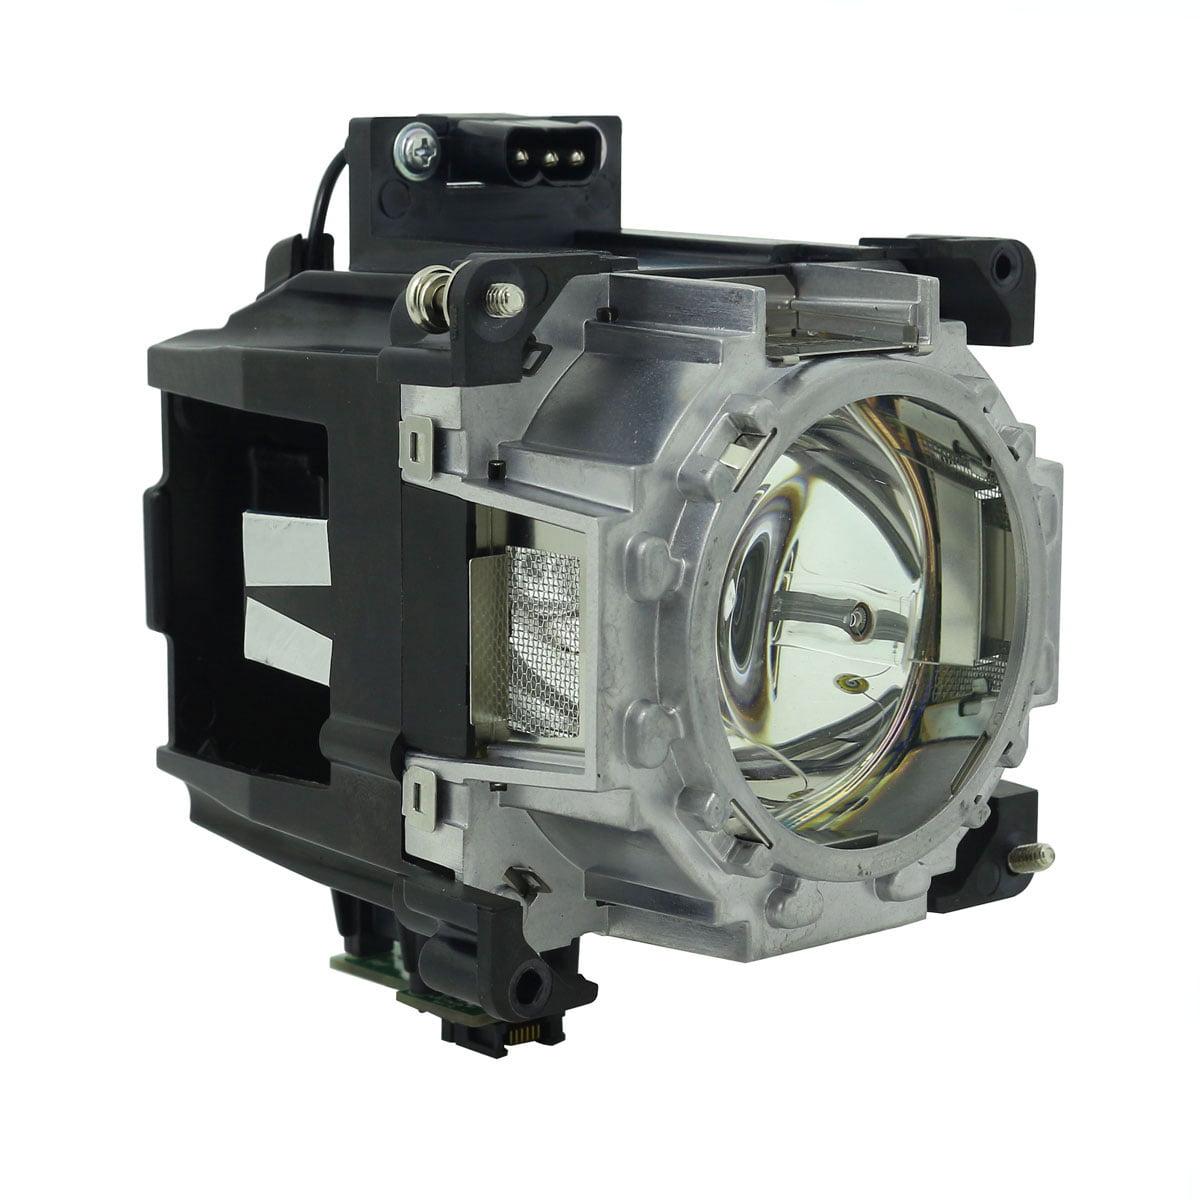 Original Ushio Projector Lamp Replacement for Panasonic PT-DW17K (Bulb Only) - image 3 de 5